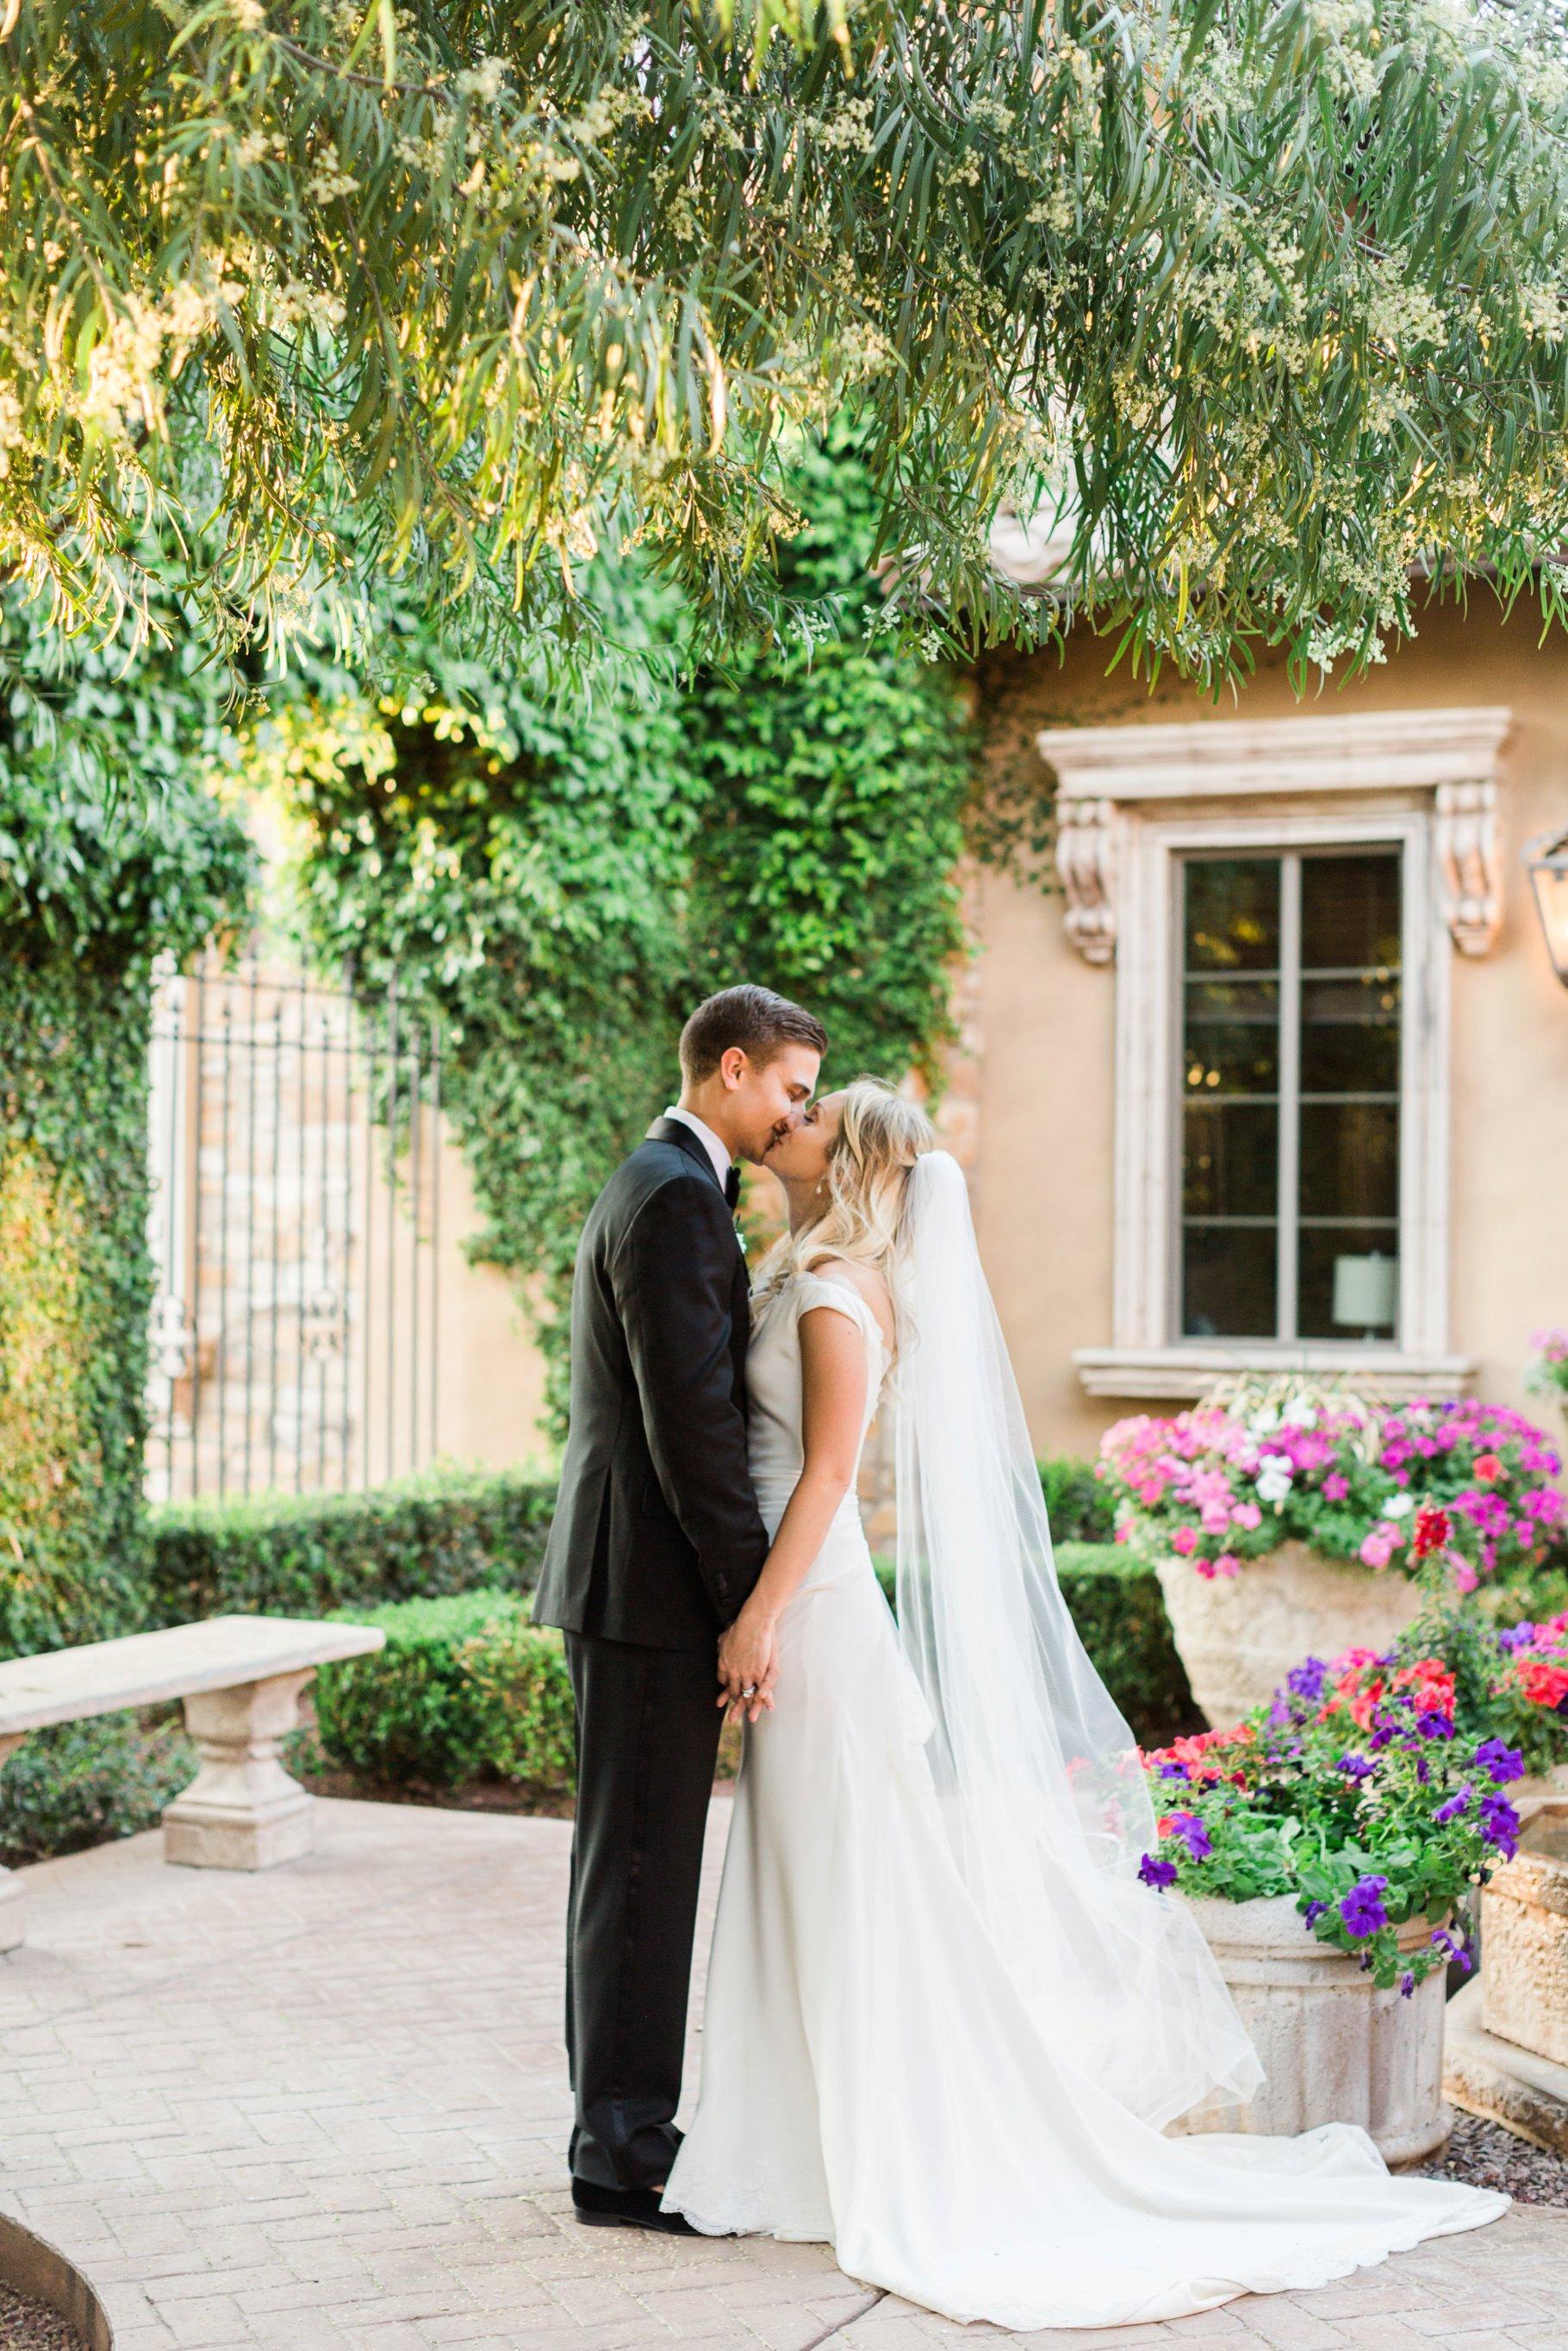 villa siena wedding-100_GRETCHEN WAKEMAN PHOTOGRAPHY.jpg